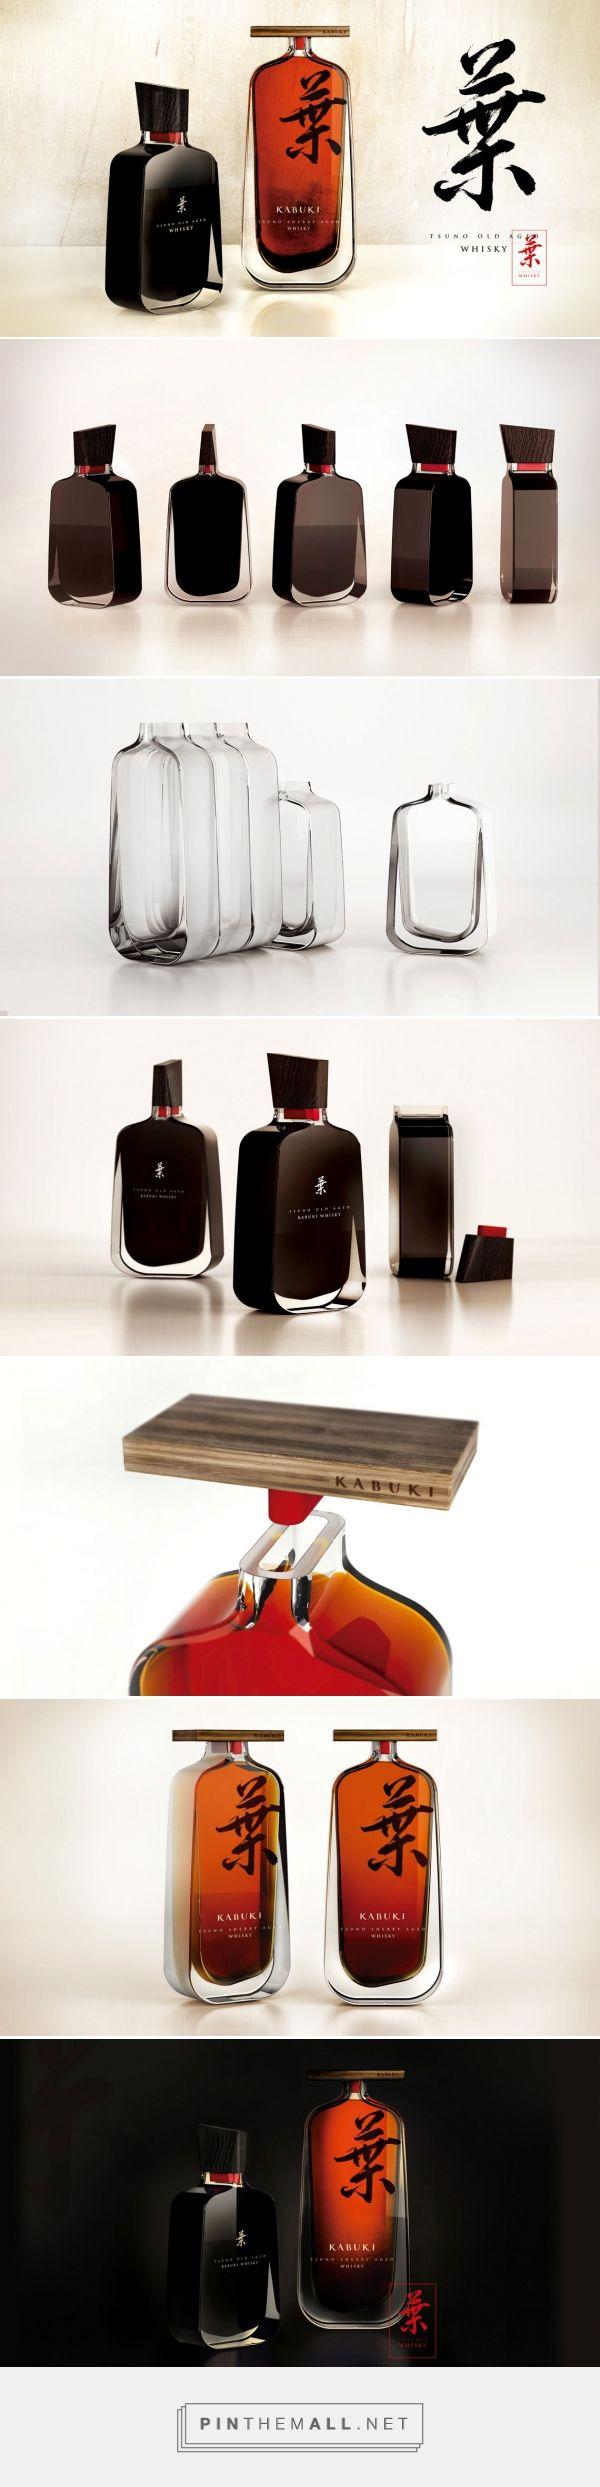 Kabuki luxury spirits packaging design concept by SeriesNemo (Spain) - http://www.packagingoftheworld.com/2016/09/kabuki-concept.html